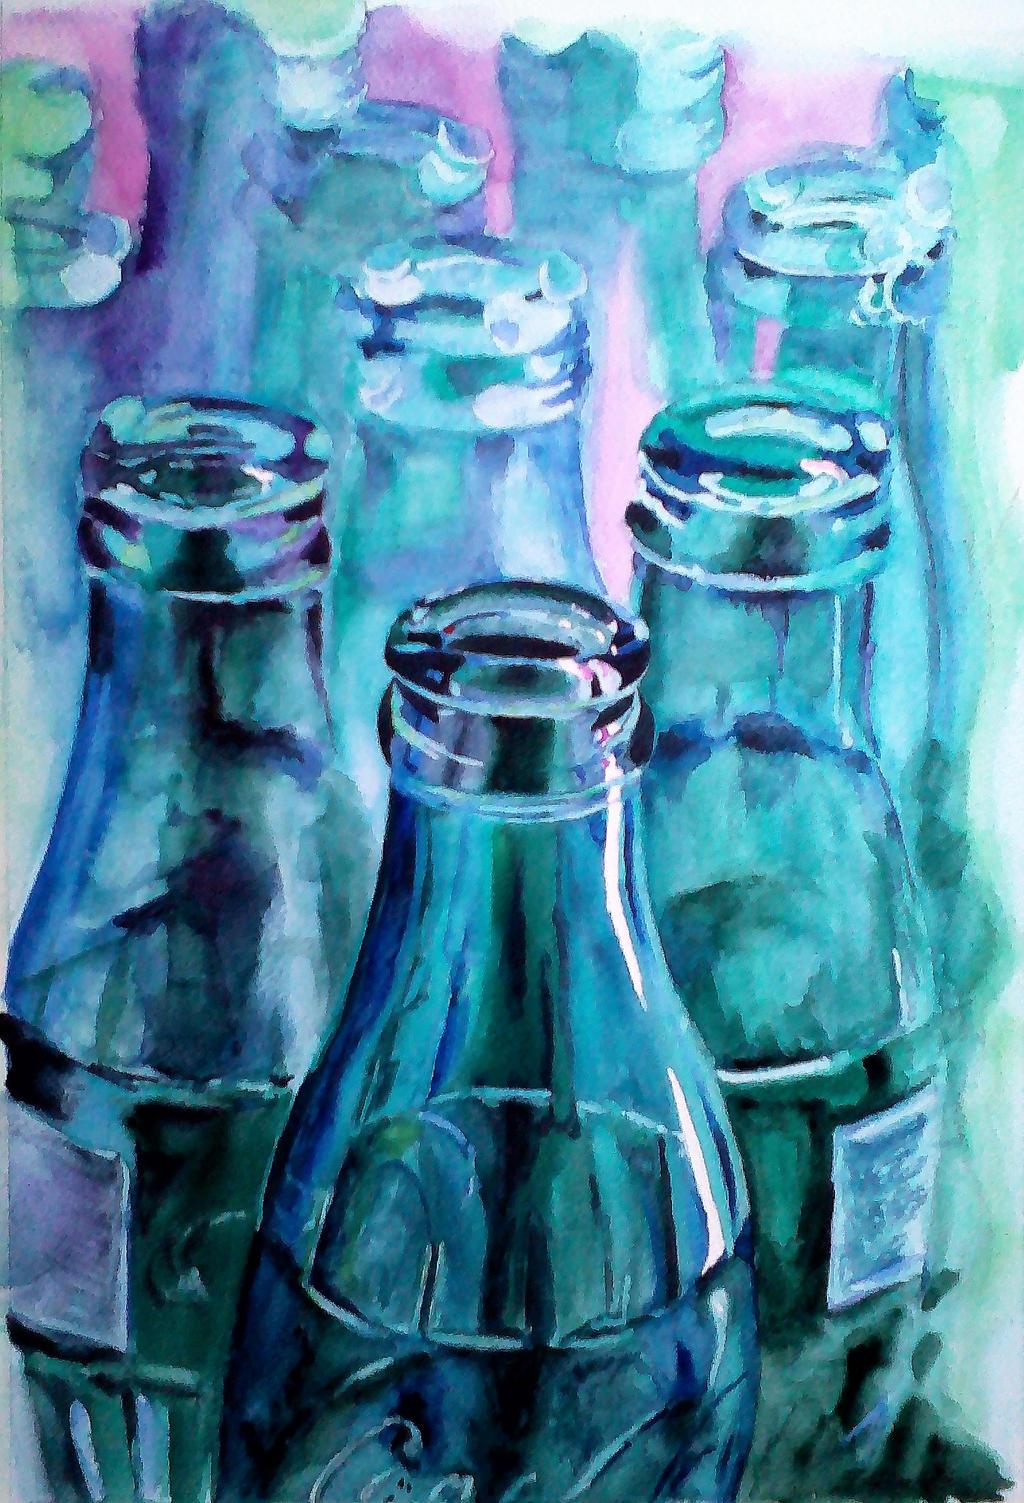 Bottles of Coke by DEstebanez